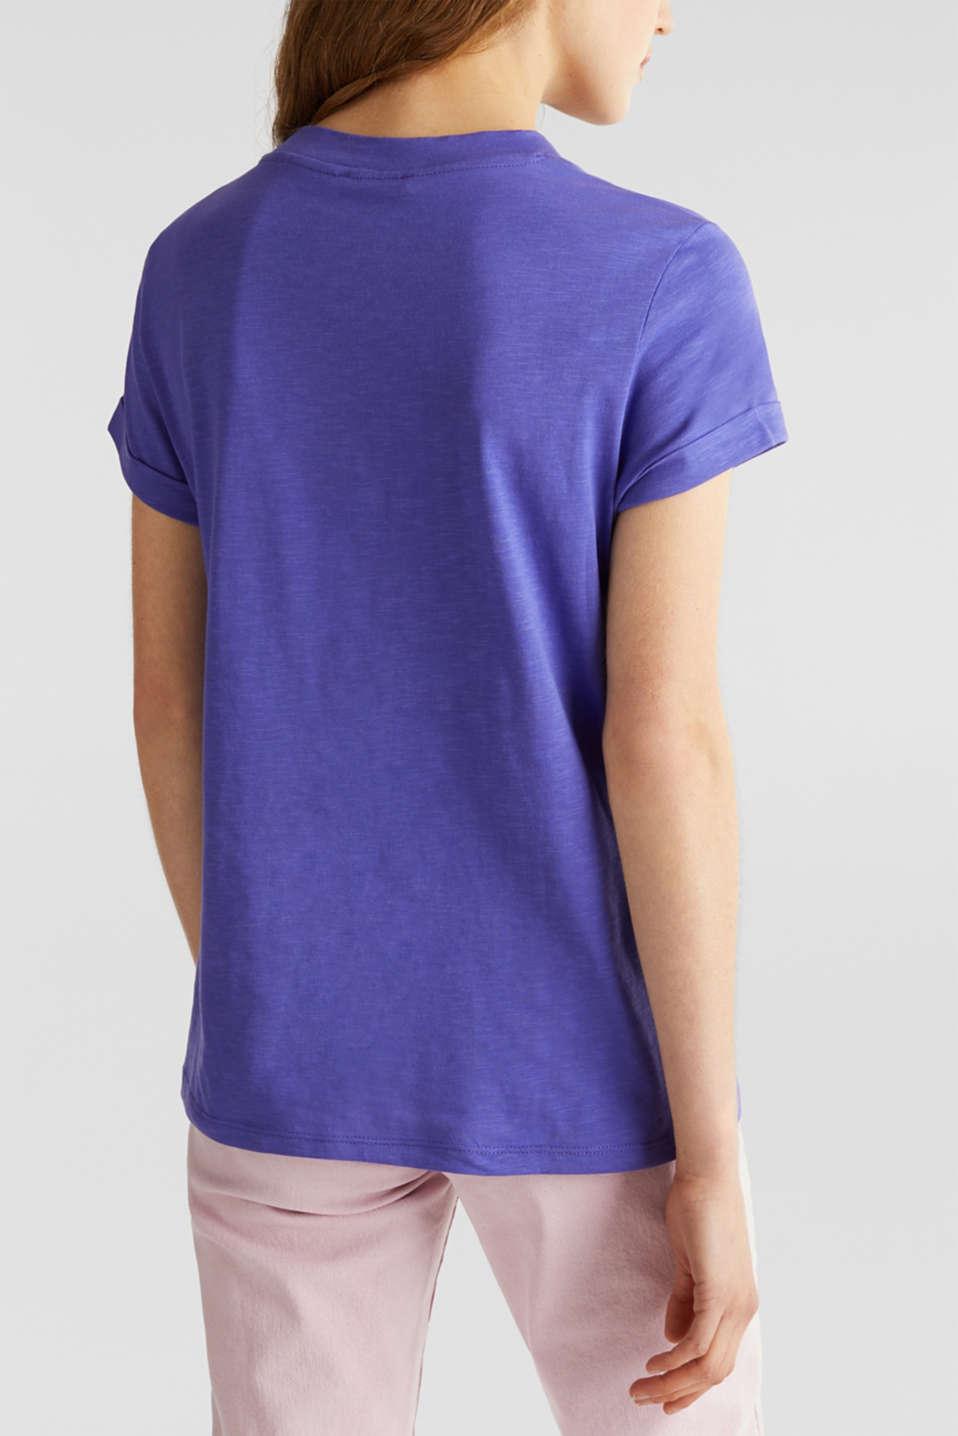 T-shirt with a striking print, 100% cotton, DARK LAVENDER, detail image number 2